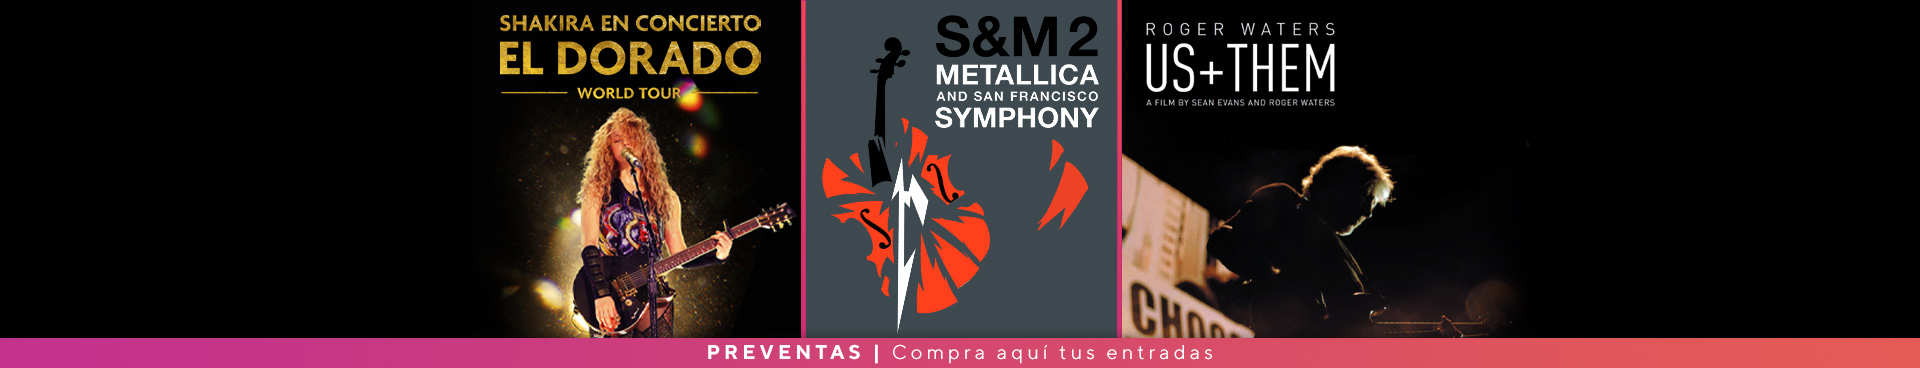 Preventa Metallica